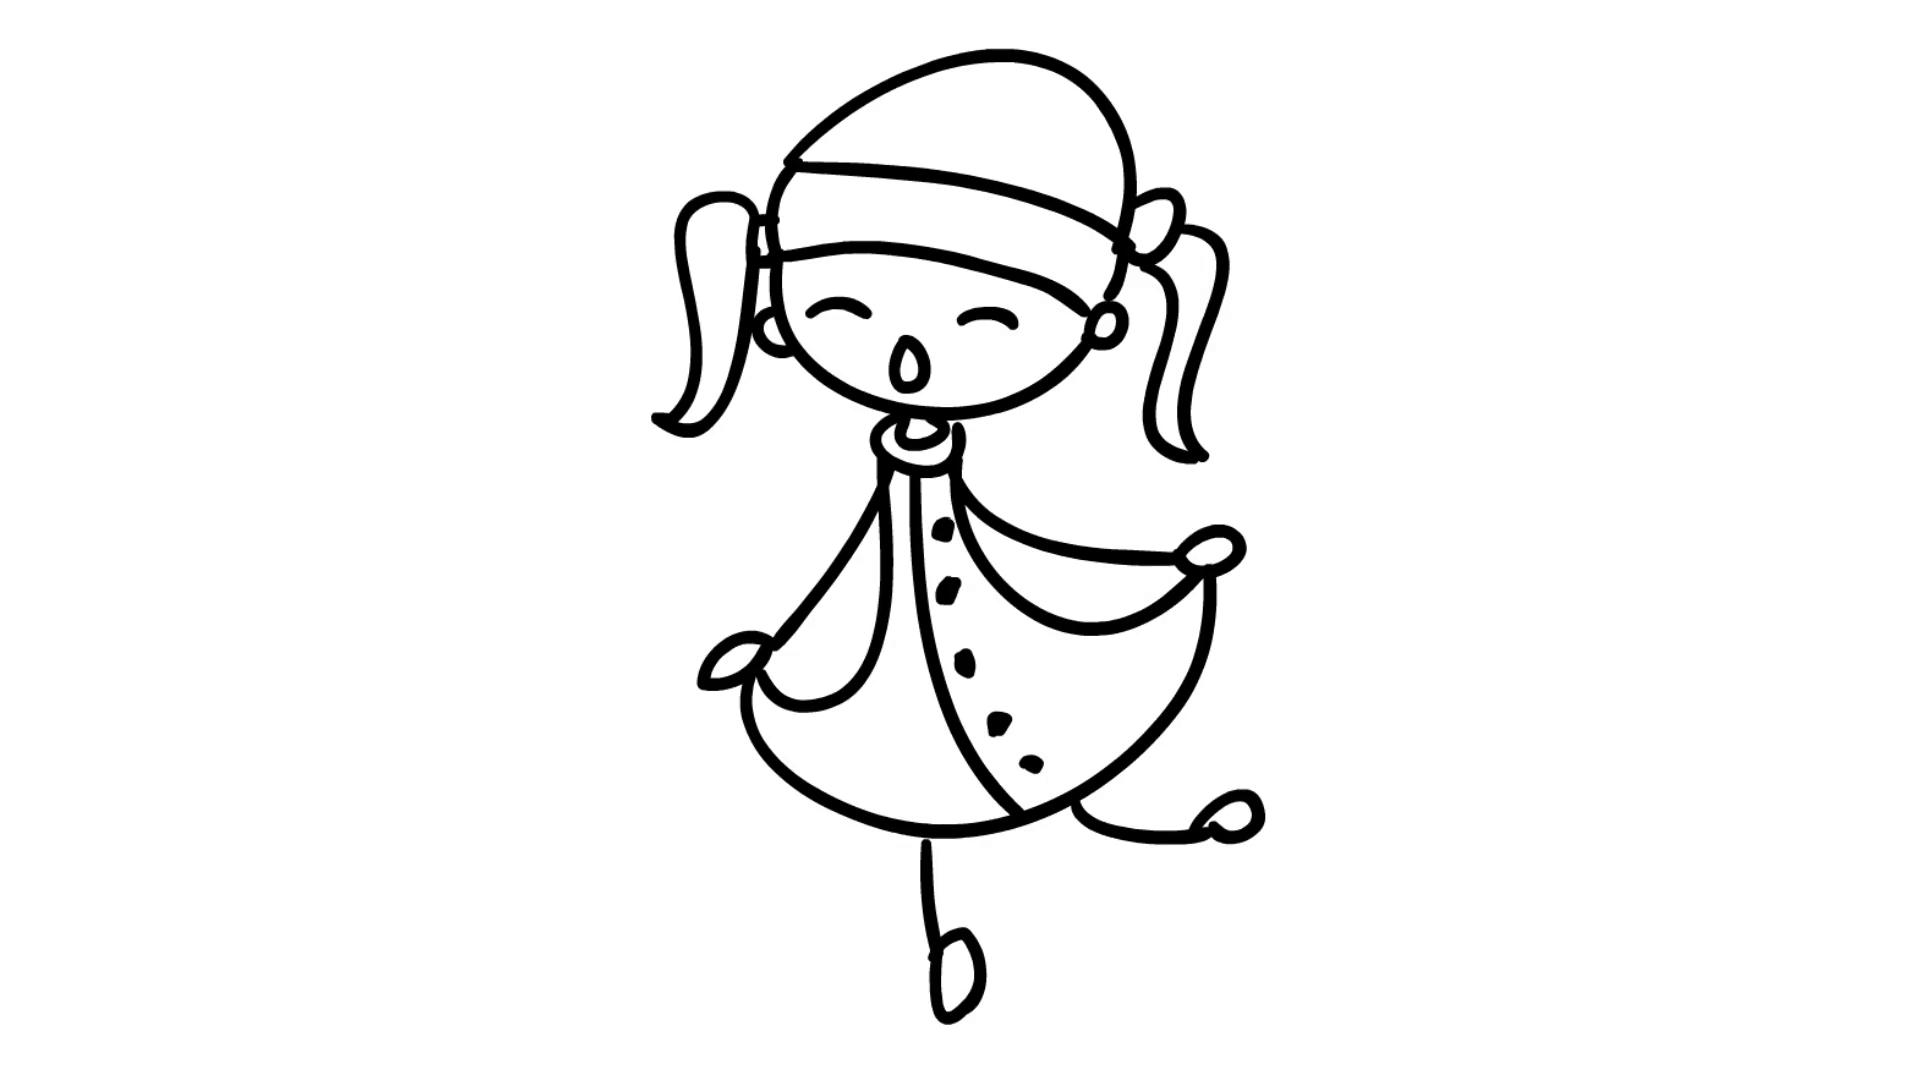 1920x1080 Christmas Kids Playing Line Drawing Illustration Animation